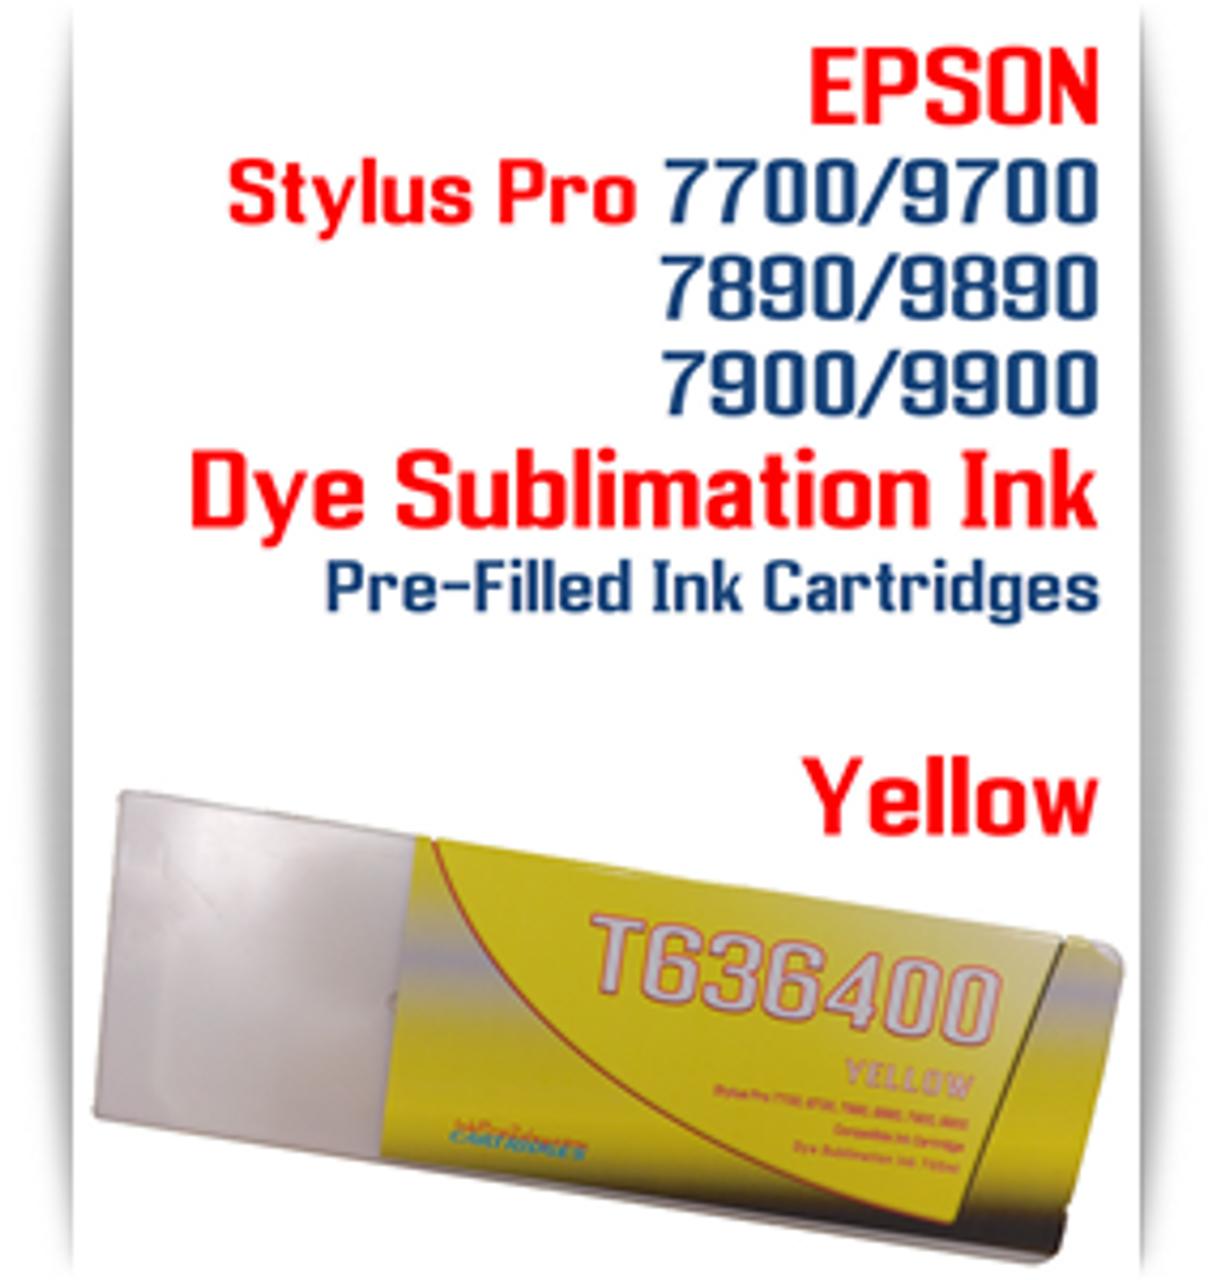 Yellow Epson Stylus Pro 7890/9890 Pre-Filled Dye Sublimation Ink Cartridge